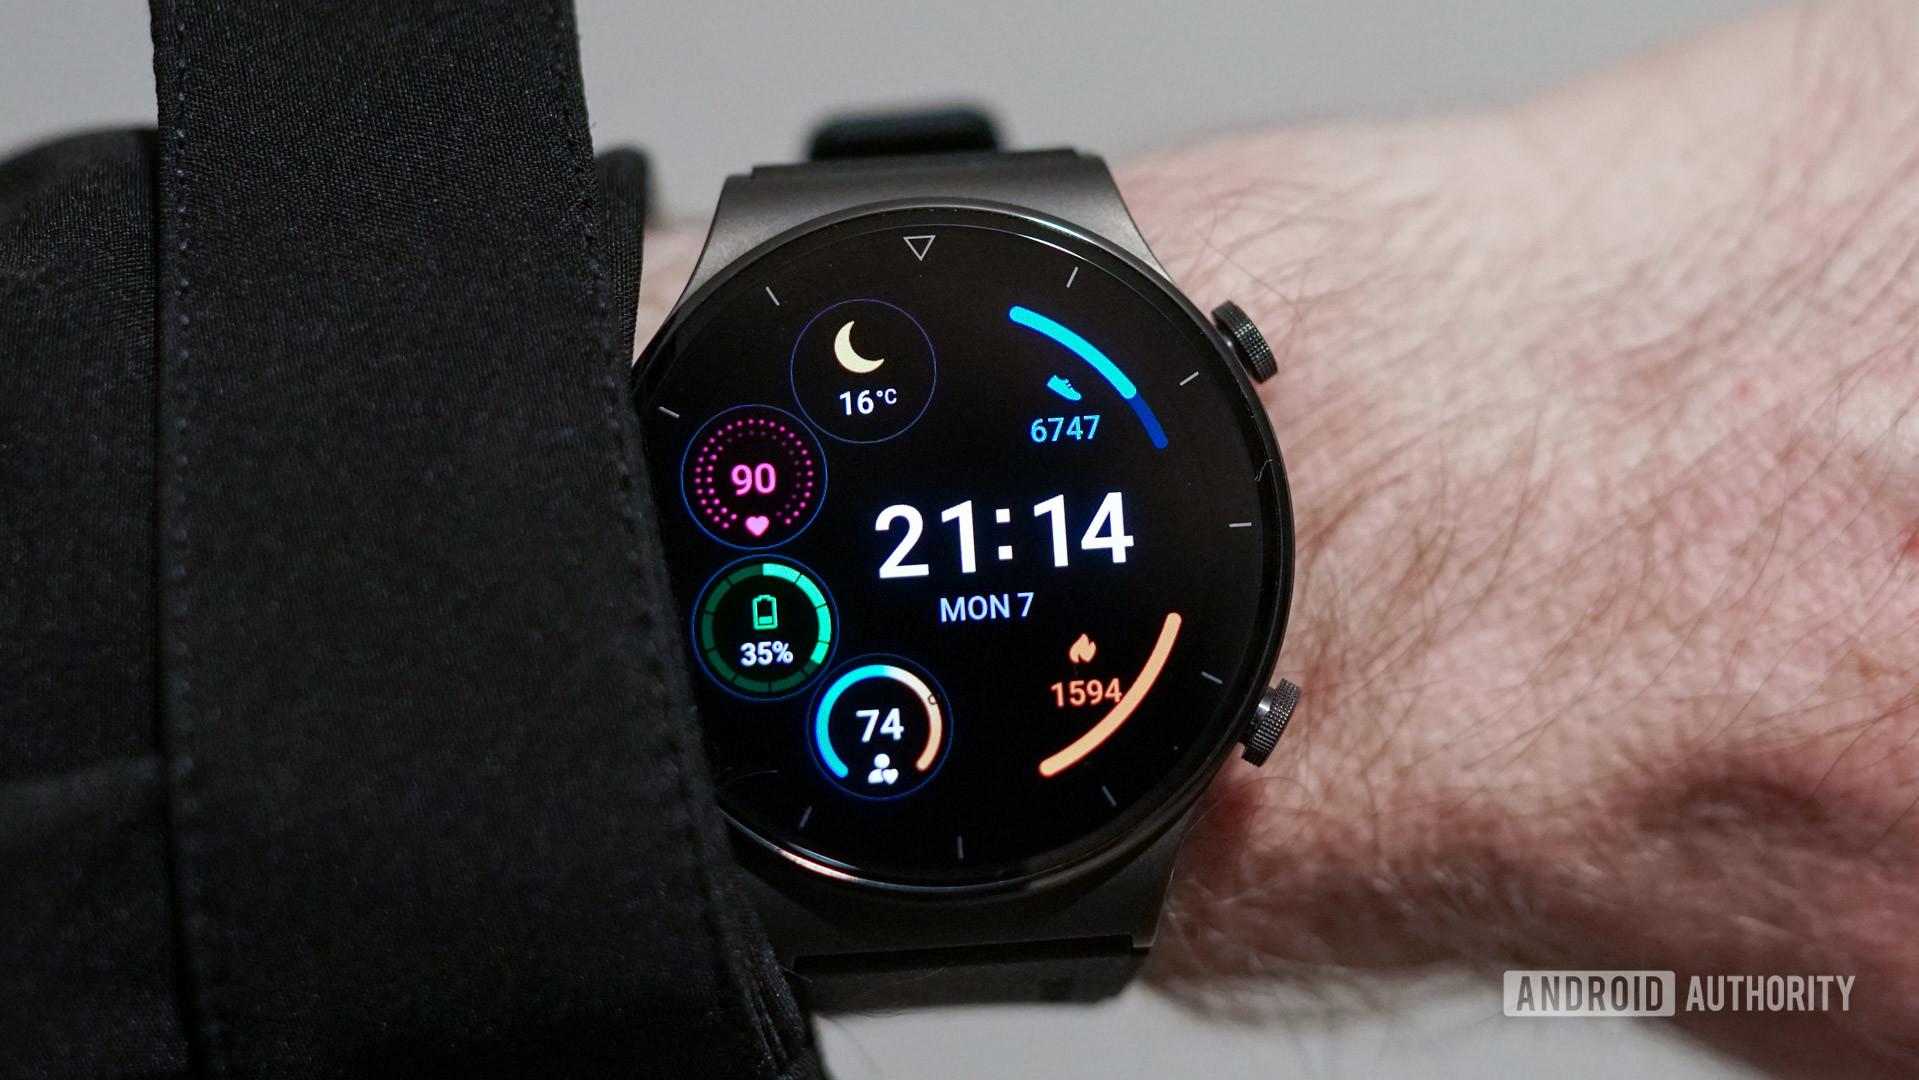 Huawei Watch GT 2 Pro smartwatch face 1